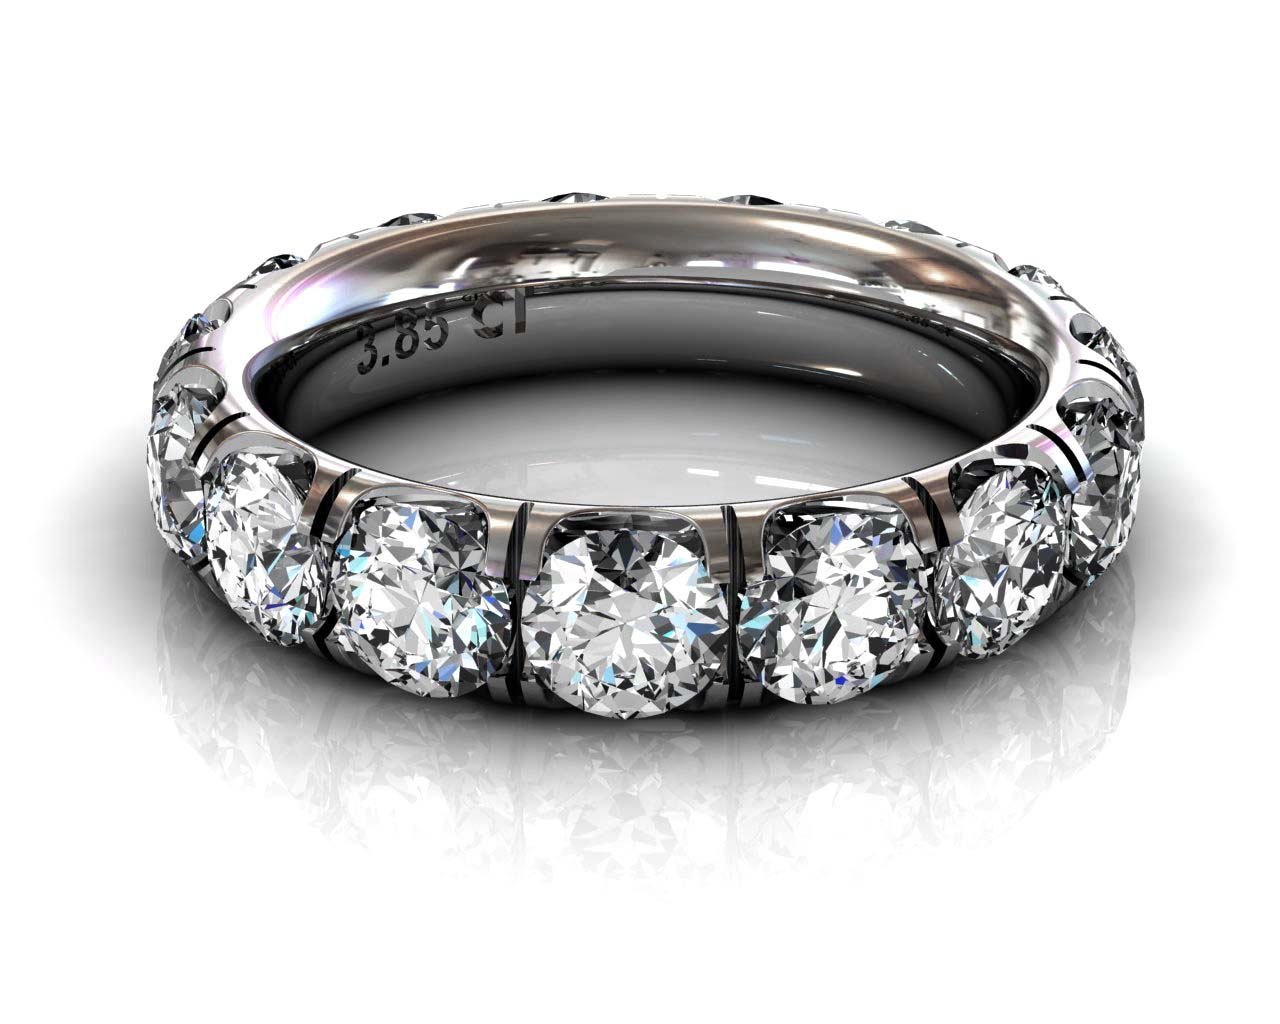 Wedding Bands Ladies Diamonds Craponia Setting 15 Stone 3.85 TCW Diamonds 4.60g 18kt Rose Gold